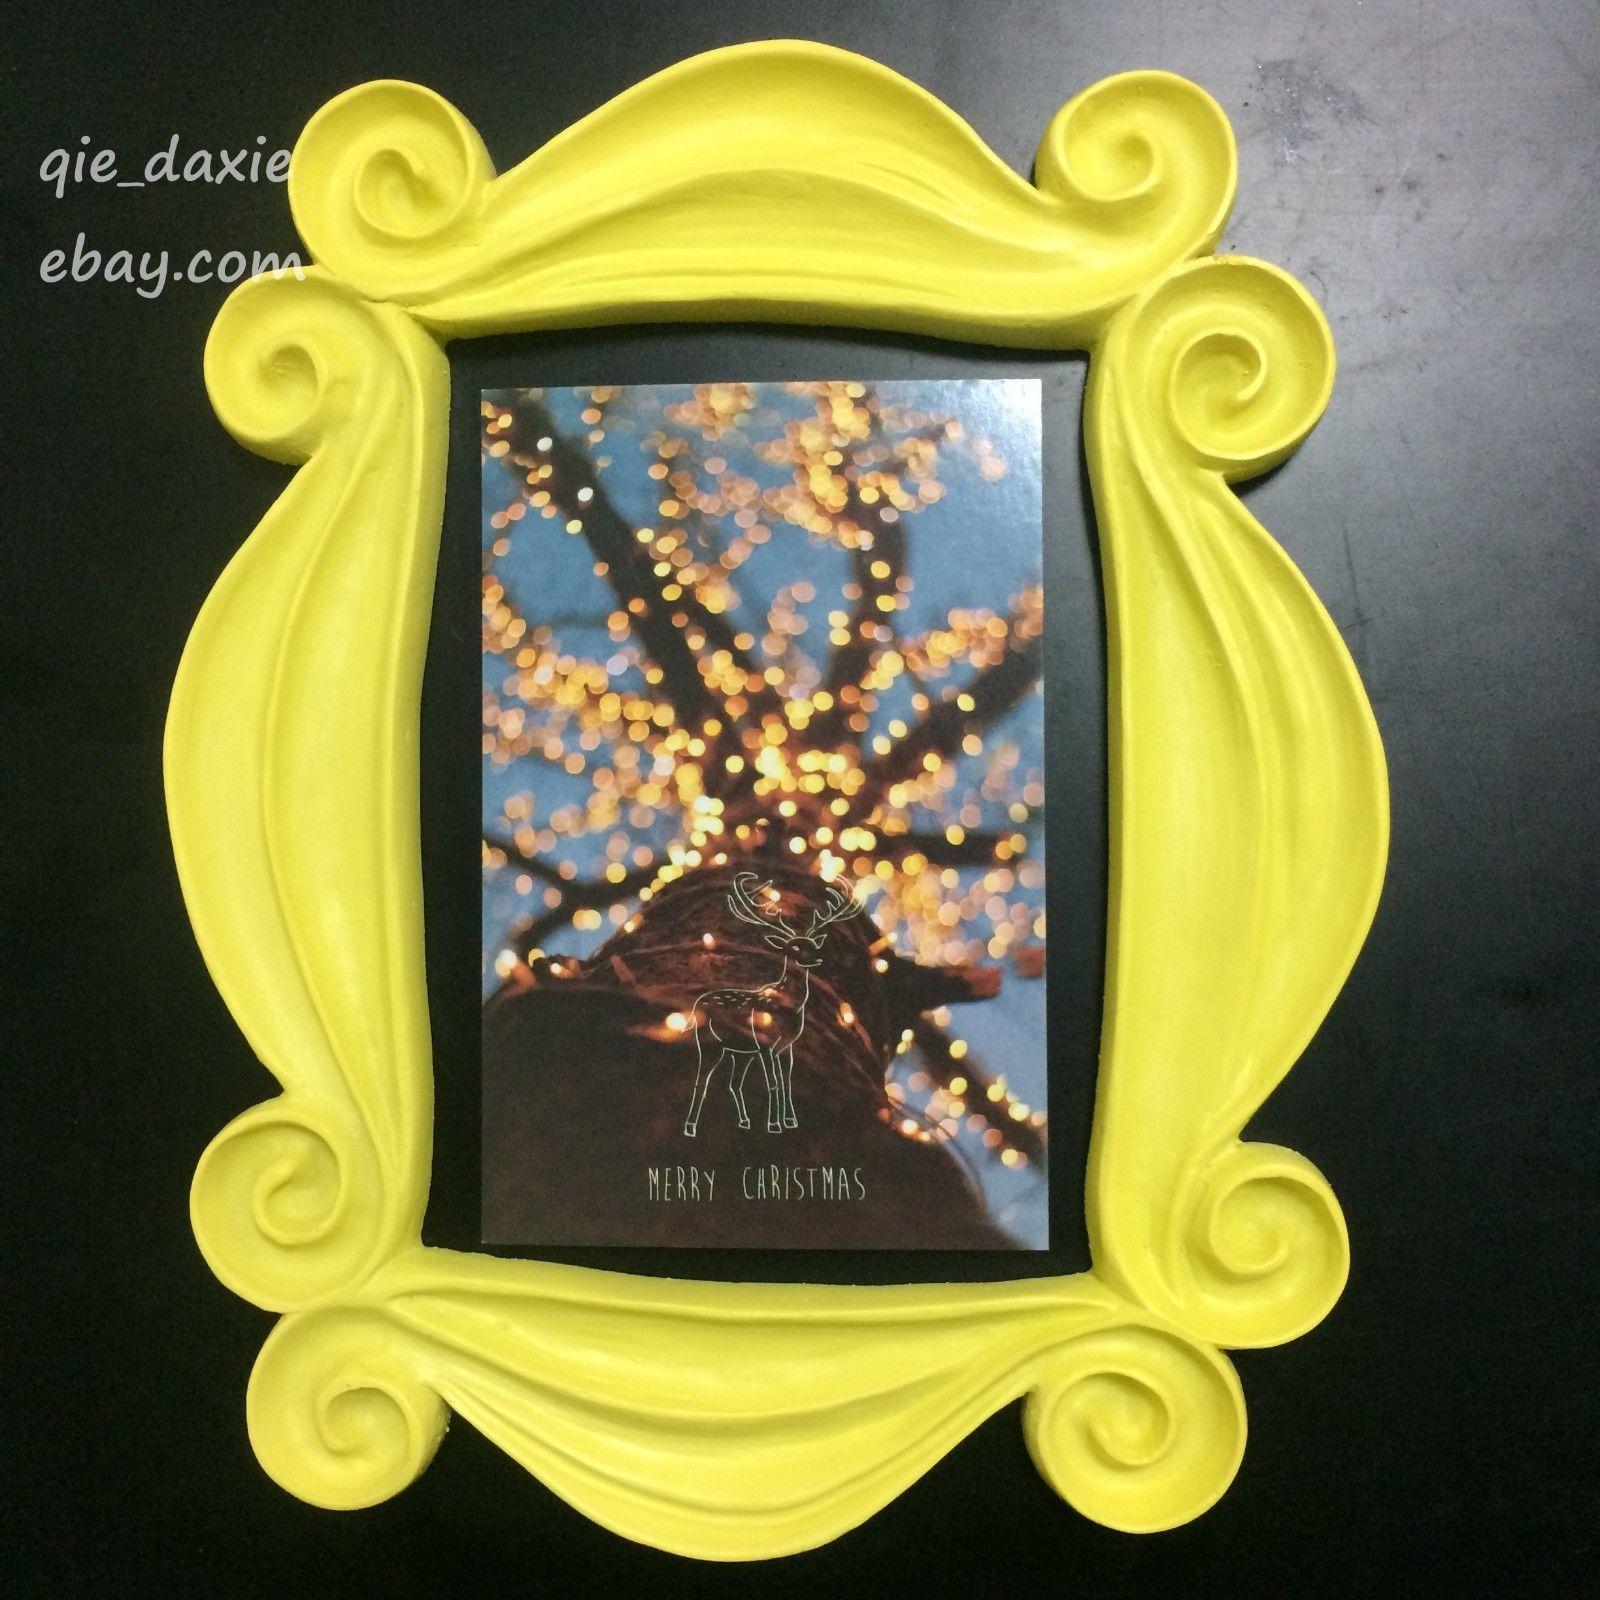 Yellow Peephole Frame as Seen on Monica\'s Door on Friends TV Show ...